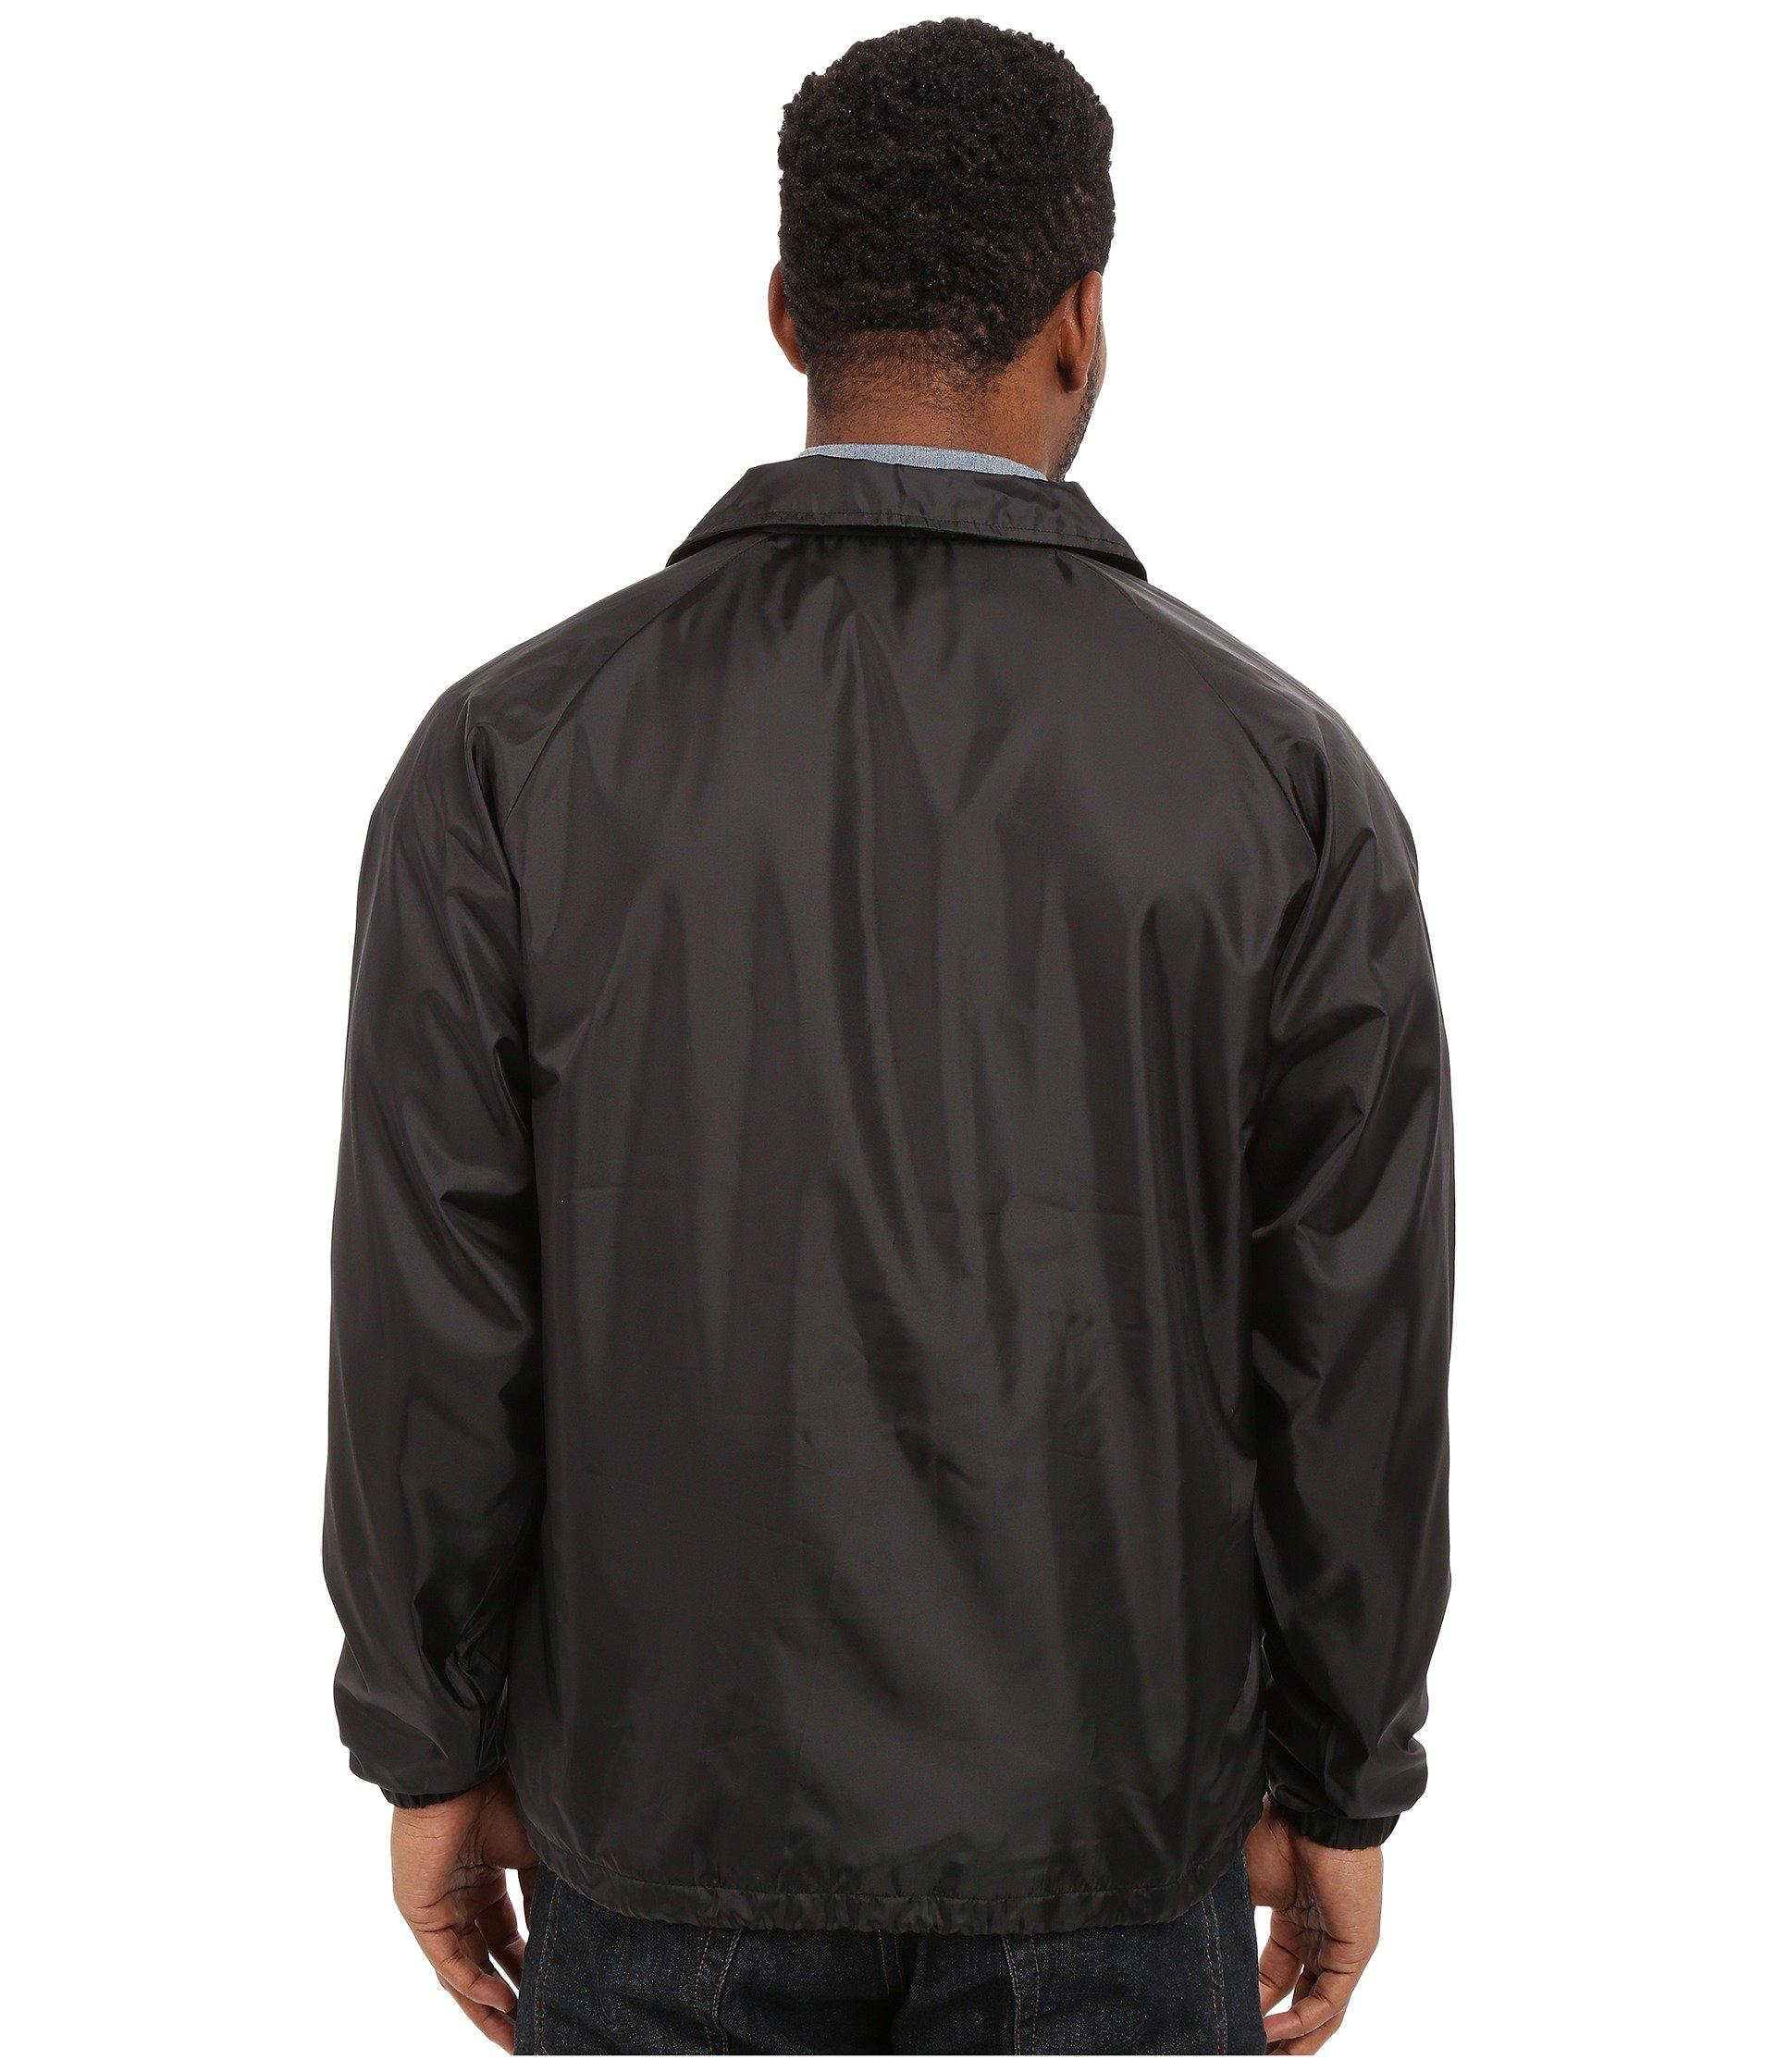 Lyst - Brixton Ramsey Jacket in Black for Men bc4959b739f